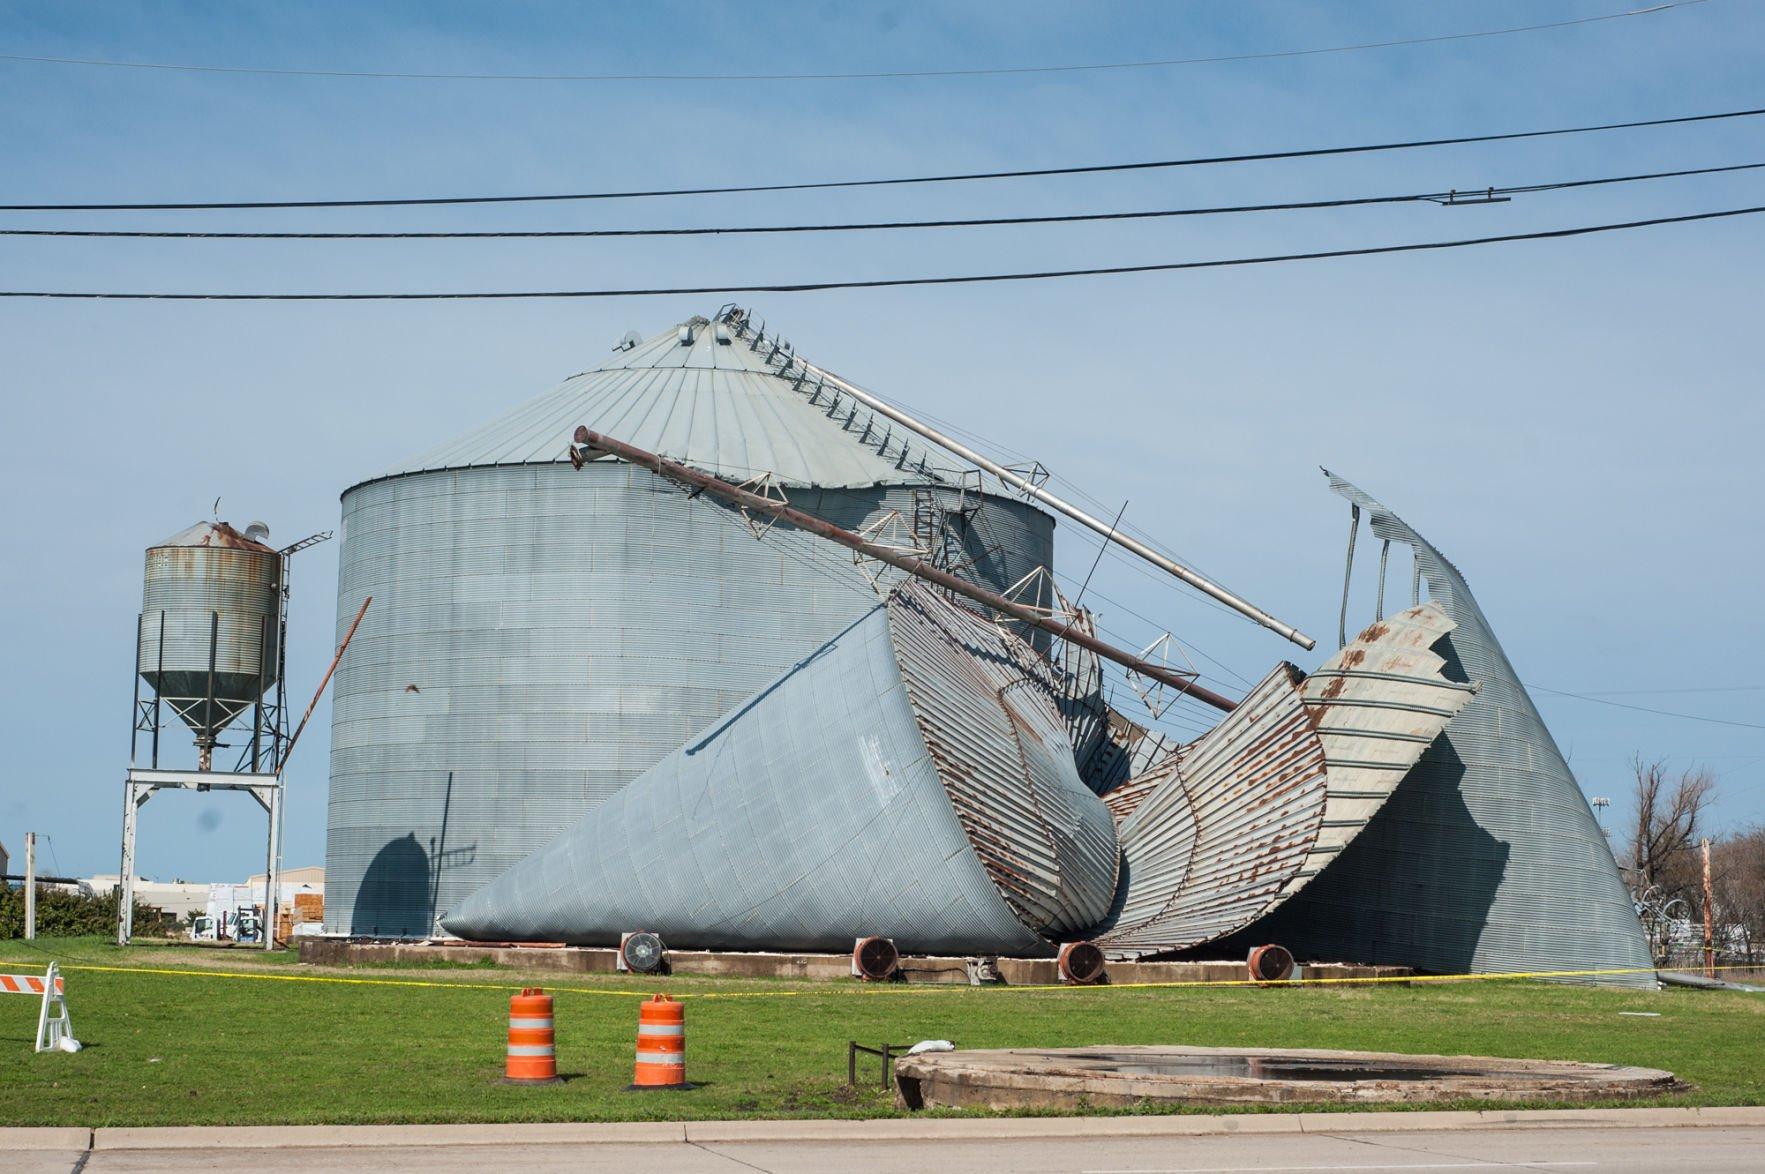 frisco grain silo collapses during tuesday storms - Silos